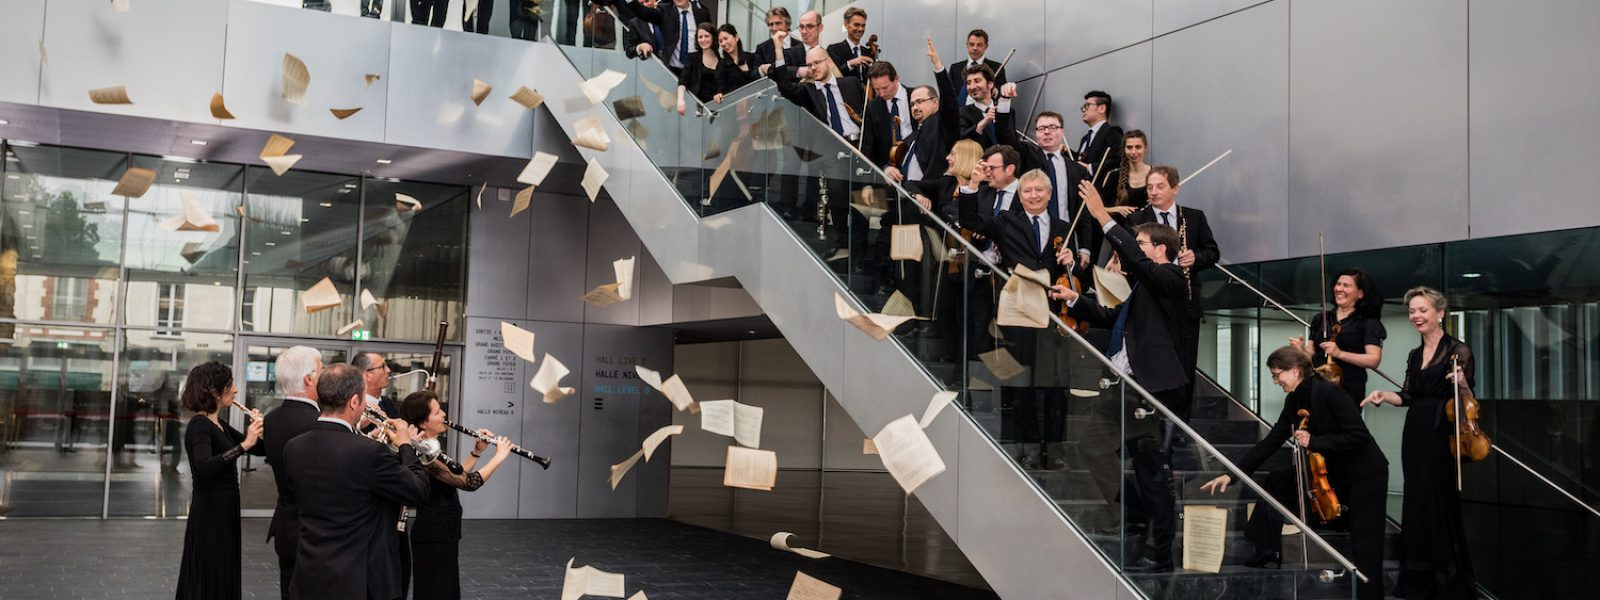 L'Orchestre Symphonique de Bretagne